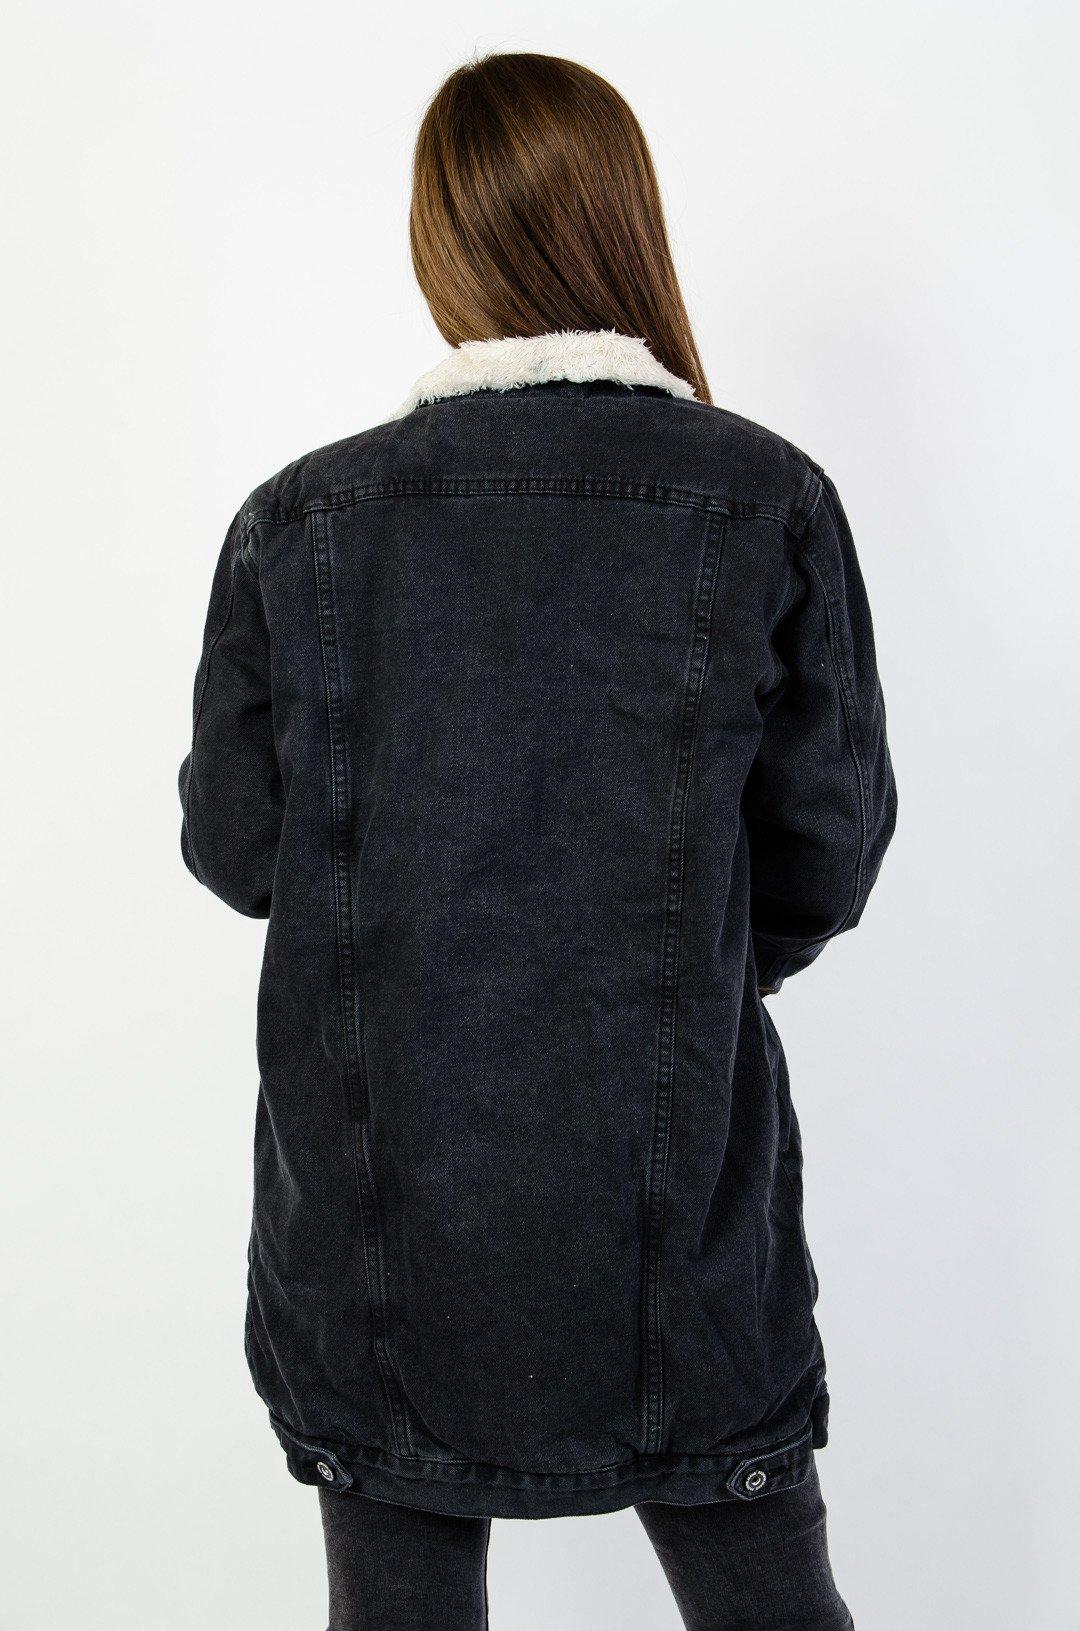 kurtka jeansowa ocieplana damska czarna